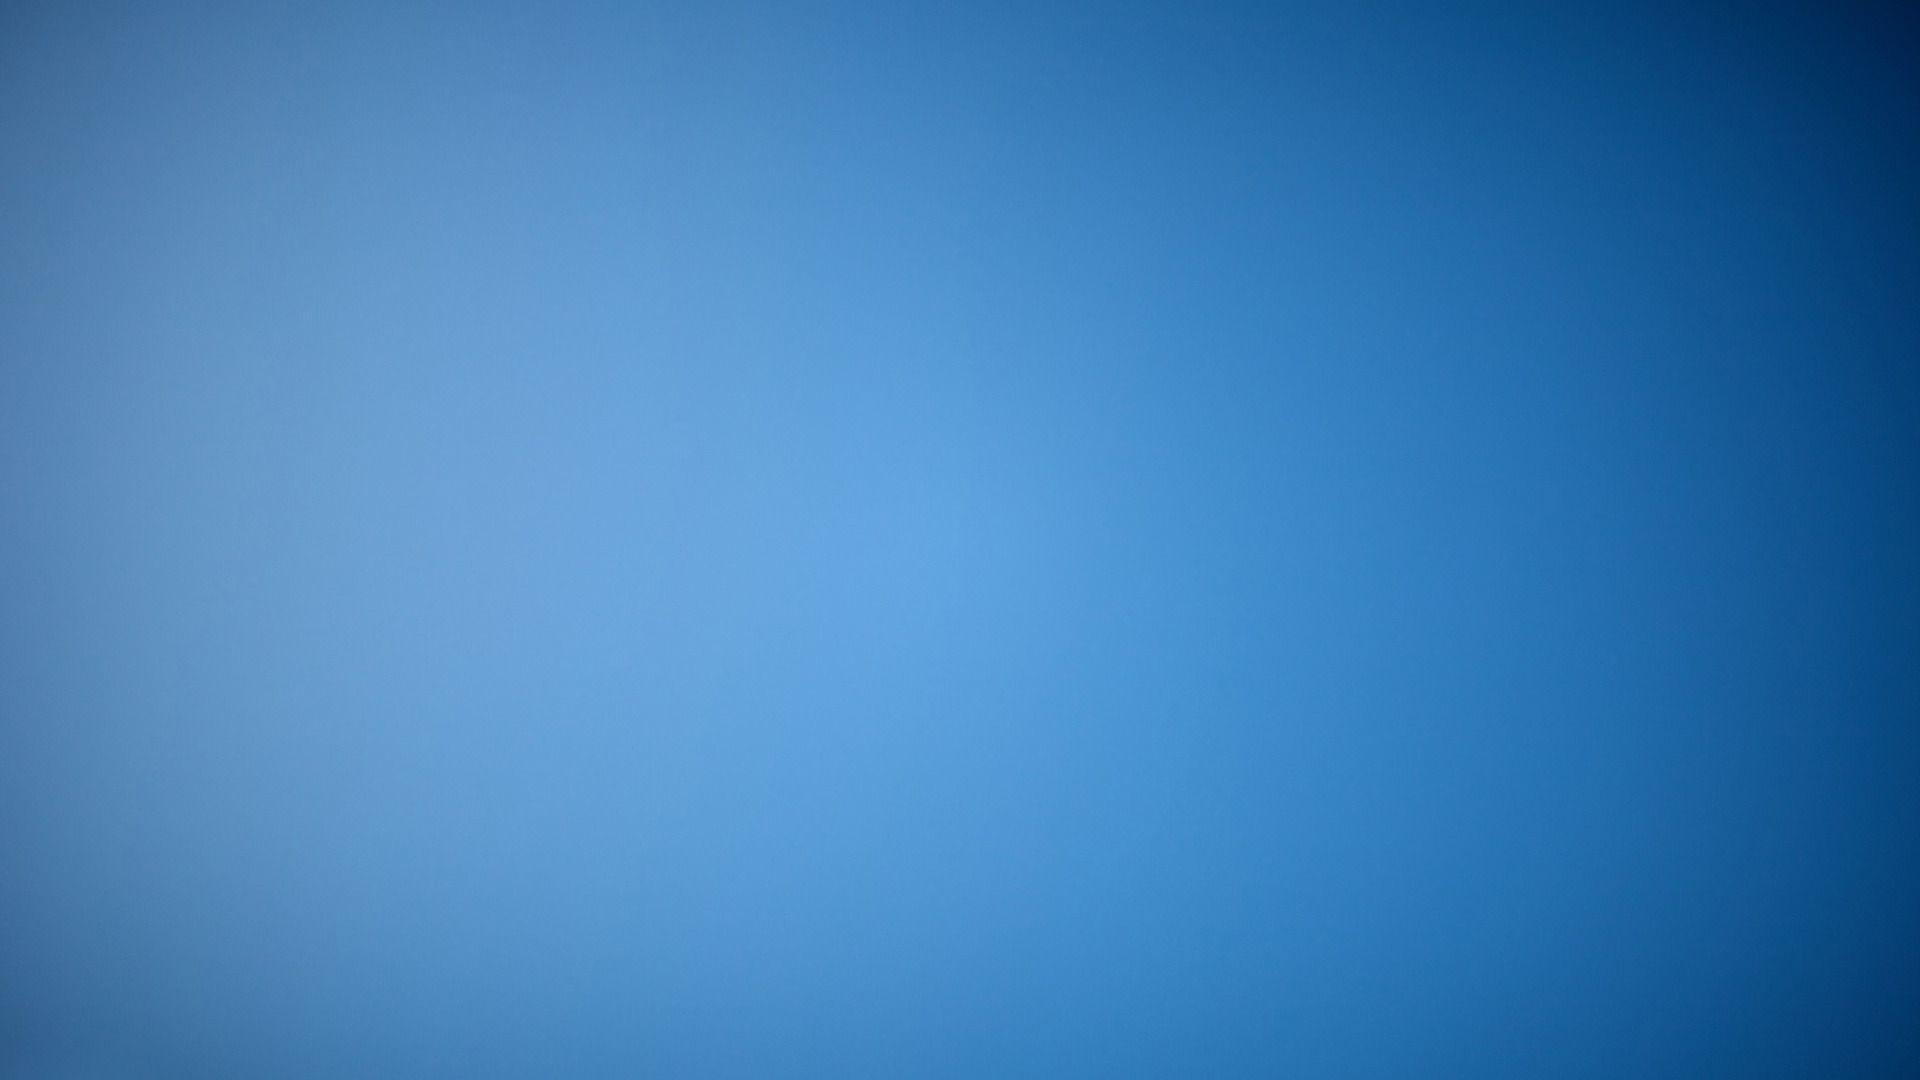 Blue Gradient Wallpaper – Wallpaper HD Base